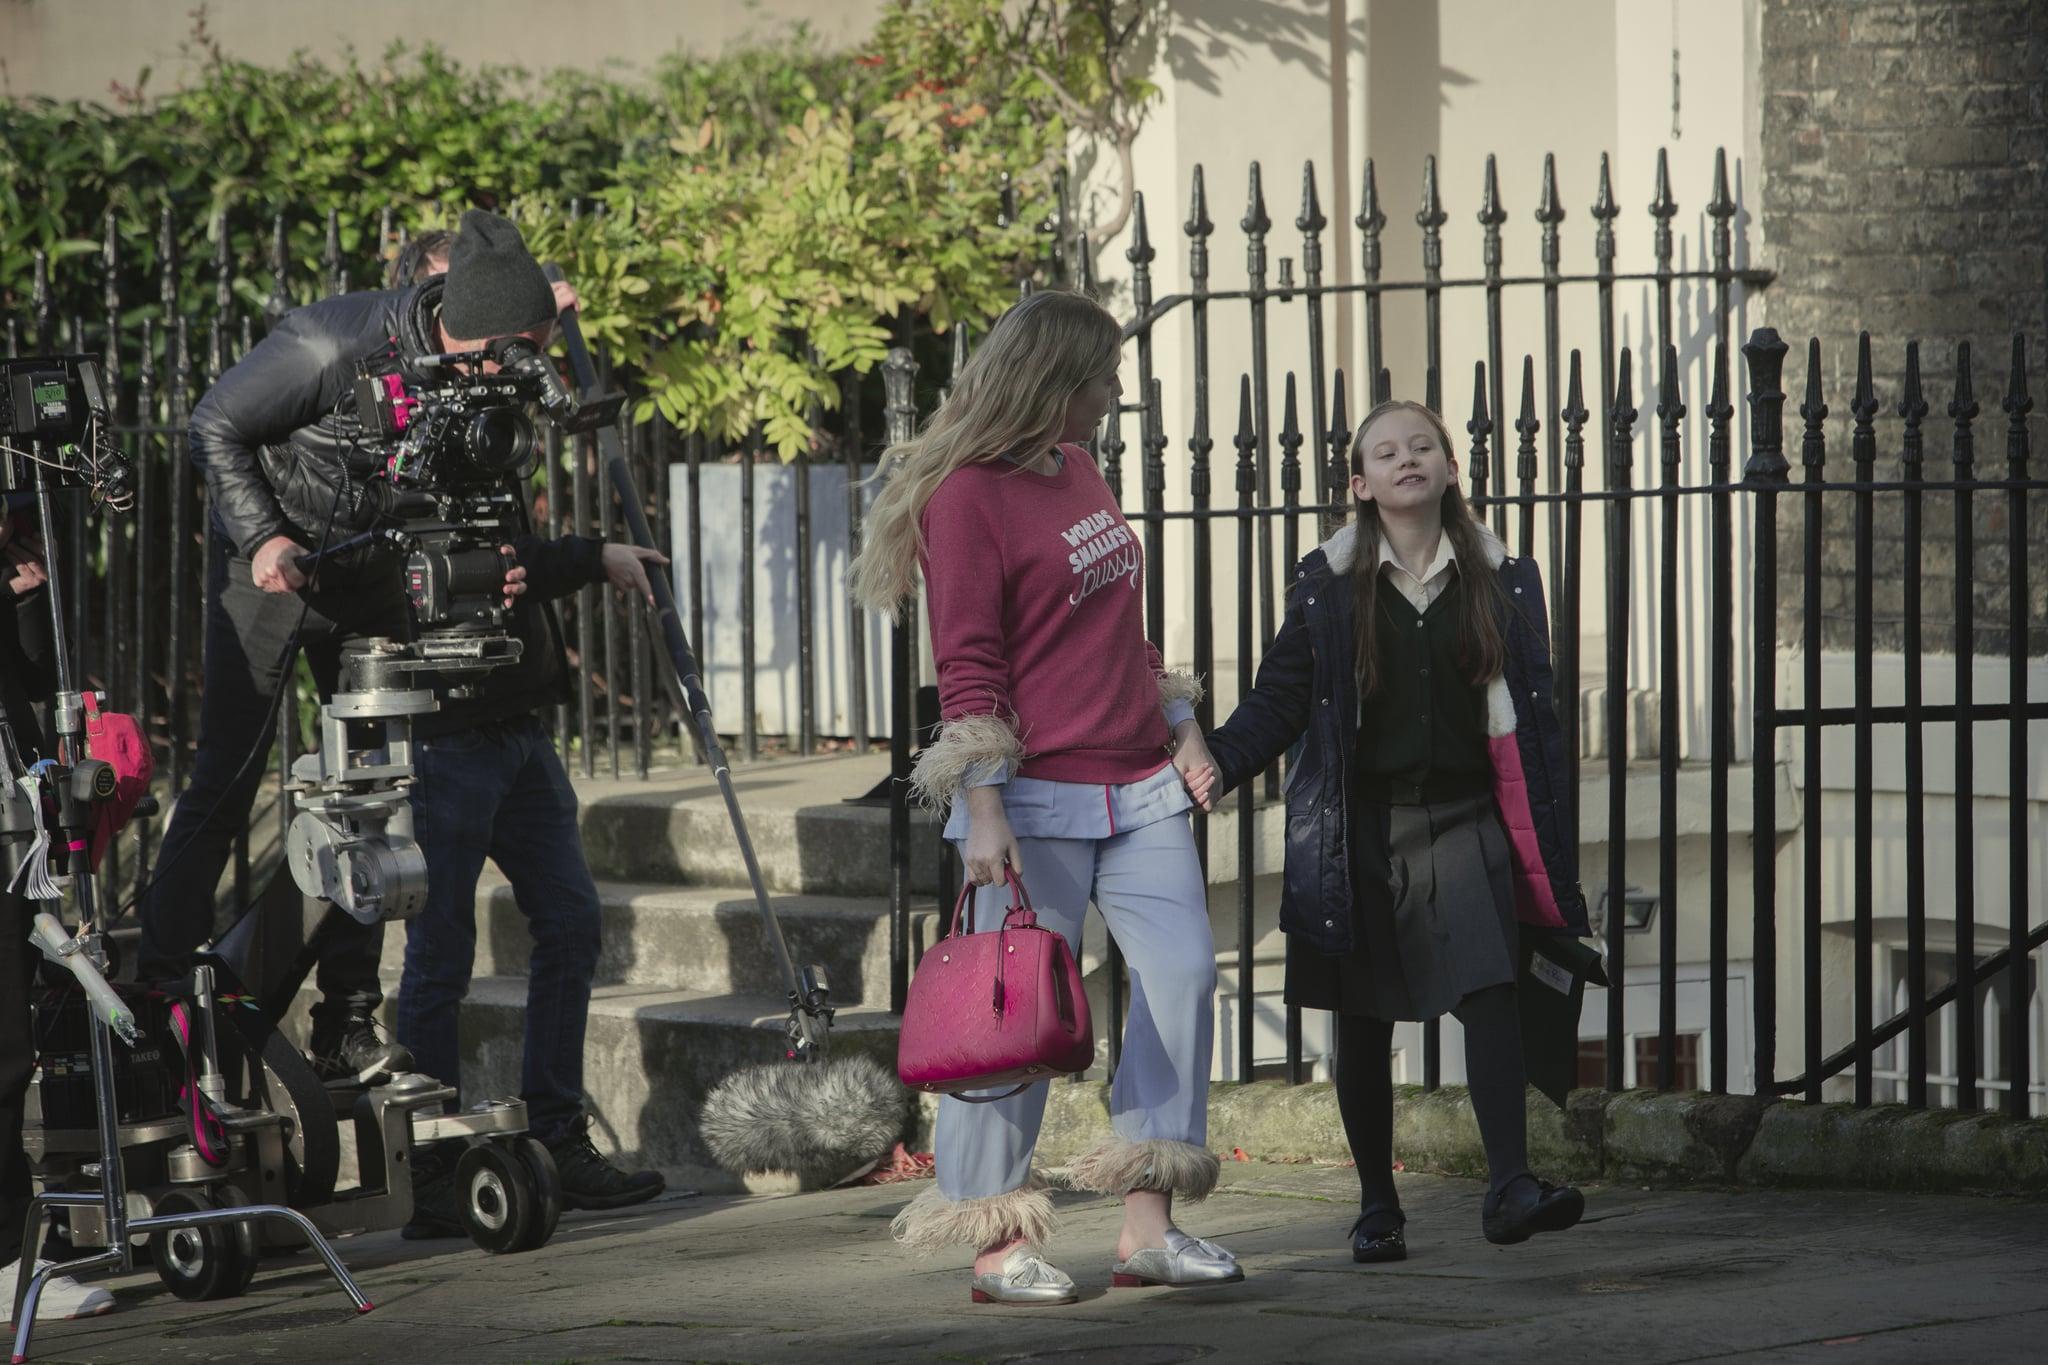 The Duchess Season 1. Katherine Ryan as Katherine in episode 1 of Duchess Season 1. Cr. Simon Ridgway/NETFLIX © 2020